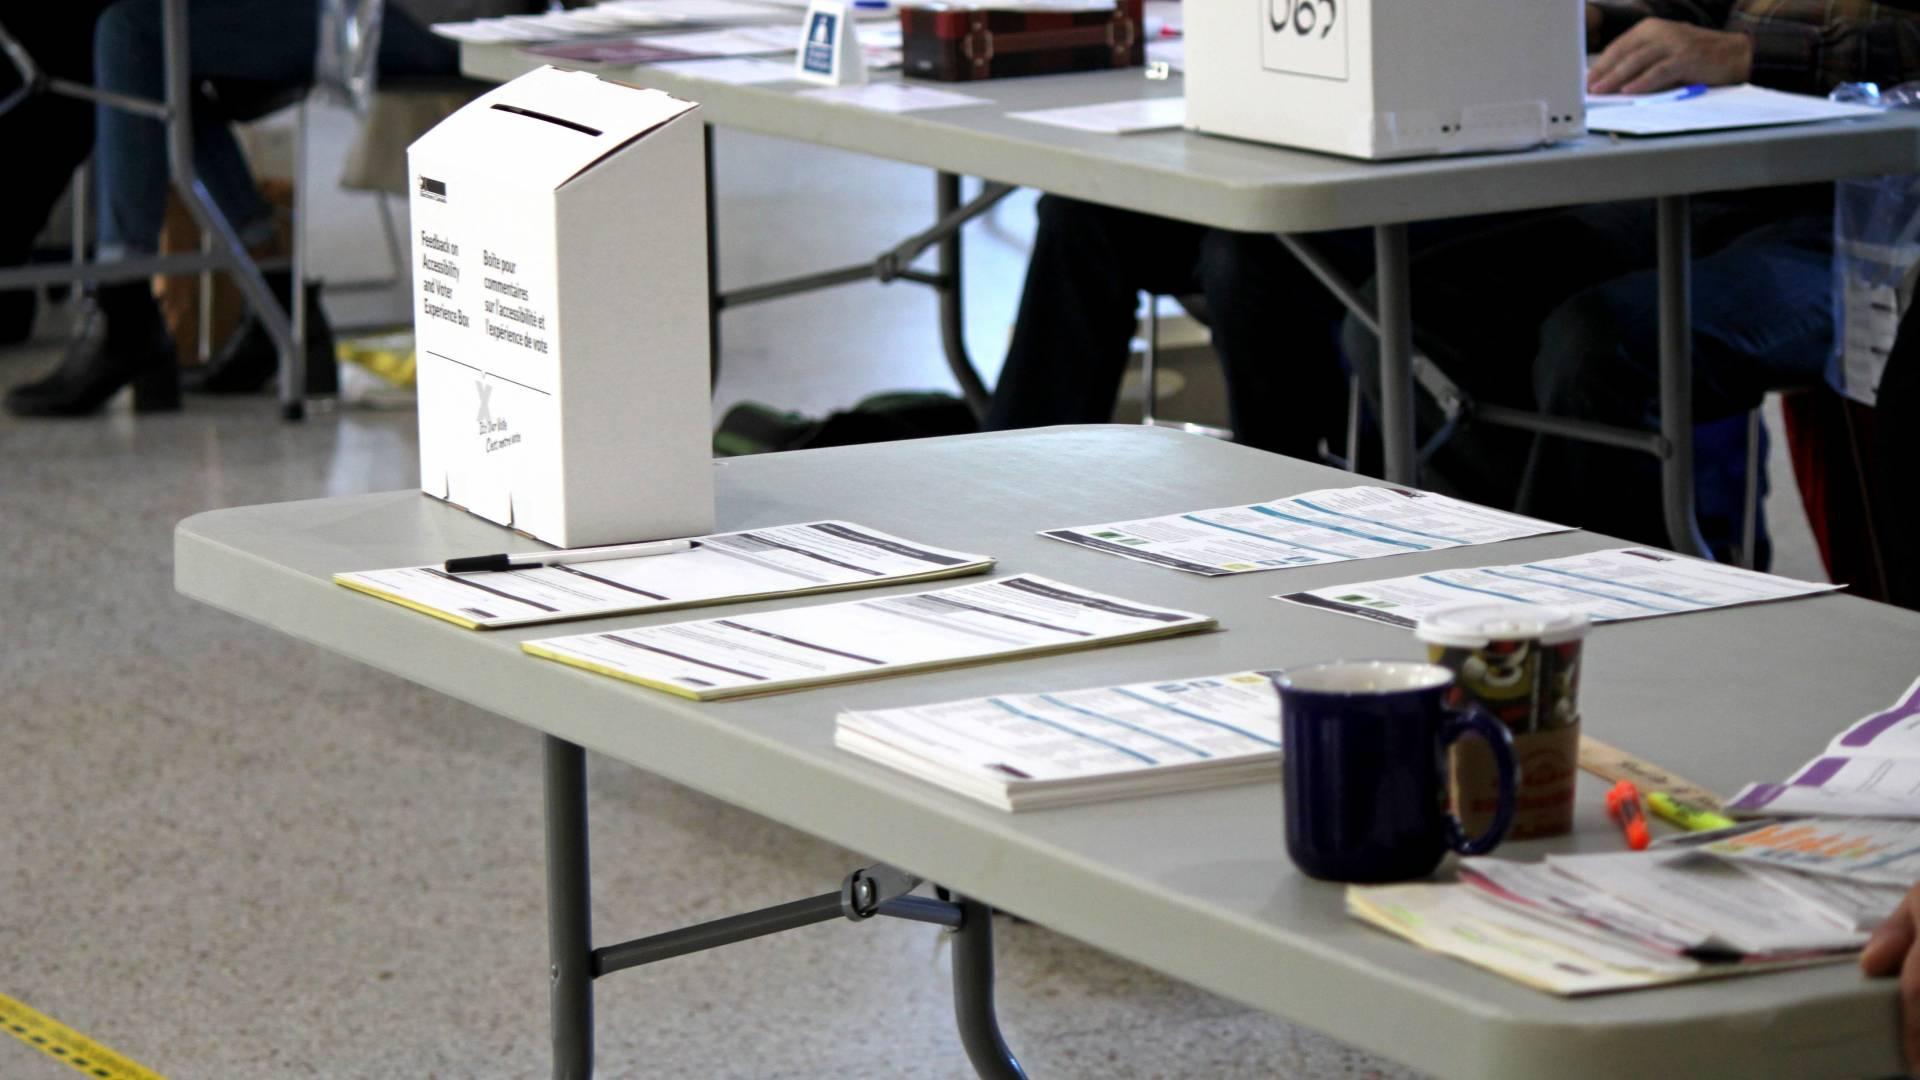 A Catholic take on the Canadian election